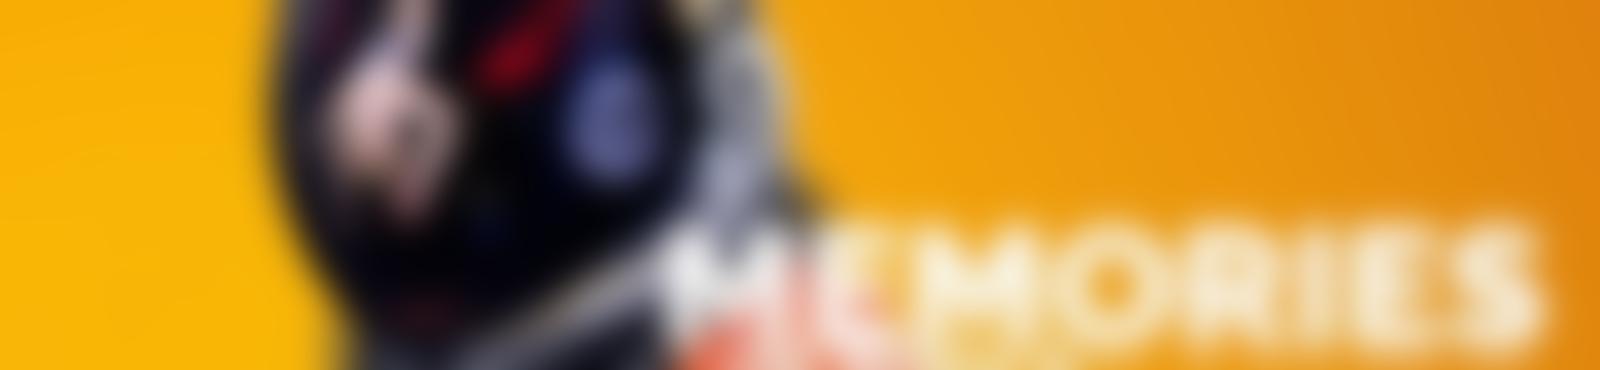 Blurred 4c70ce5d 1eec 4b76 9110 7908f0968ce6